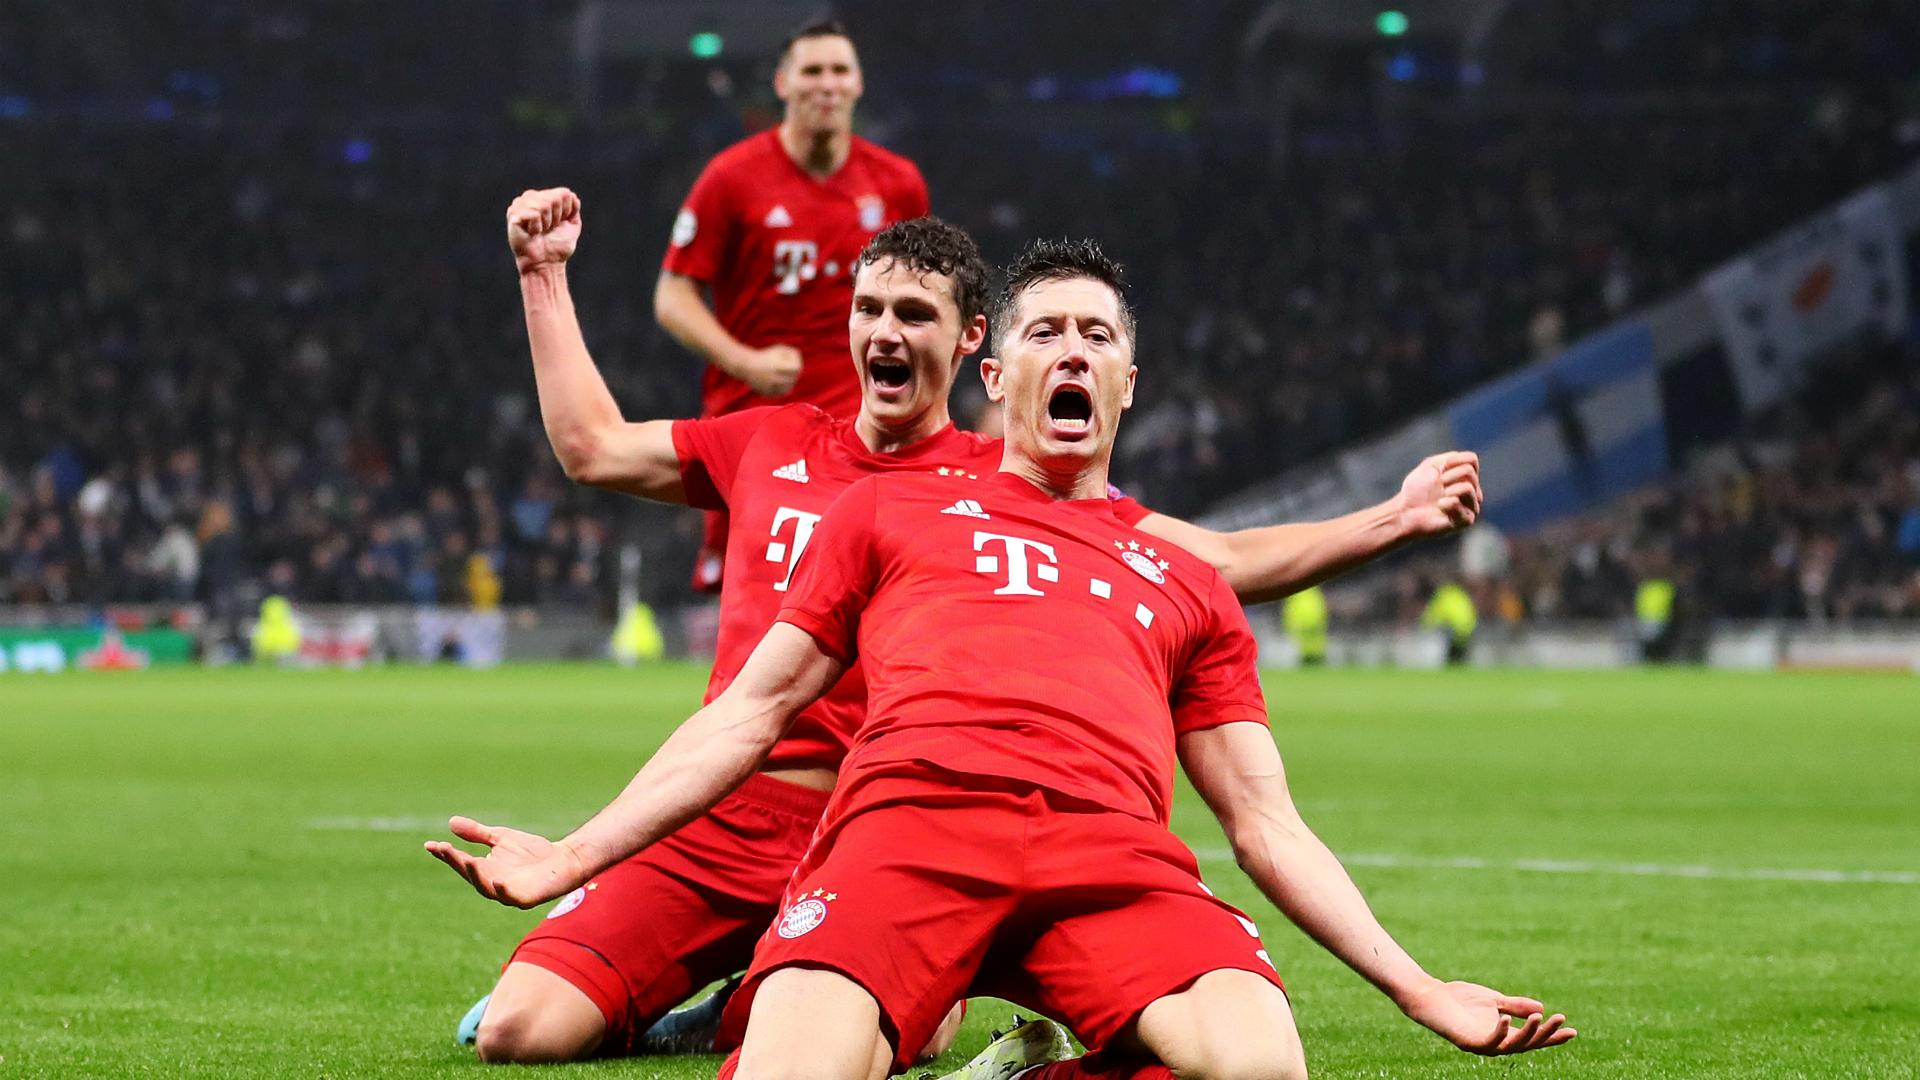 Lewandowski's goals, Muller's assists among marks set in Bayern Munich's record season 1